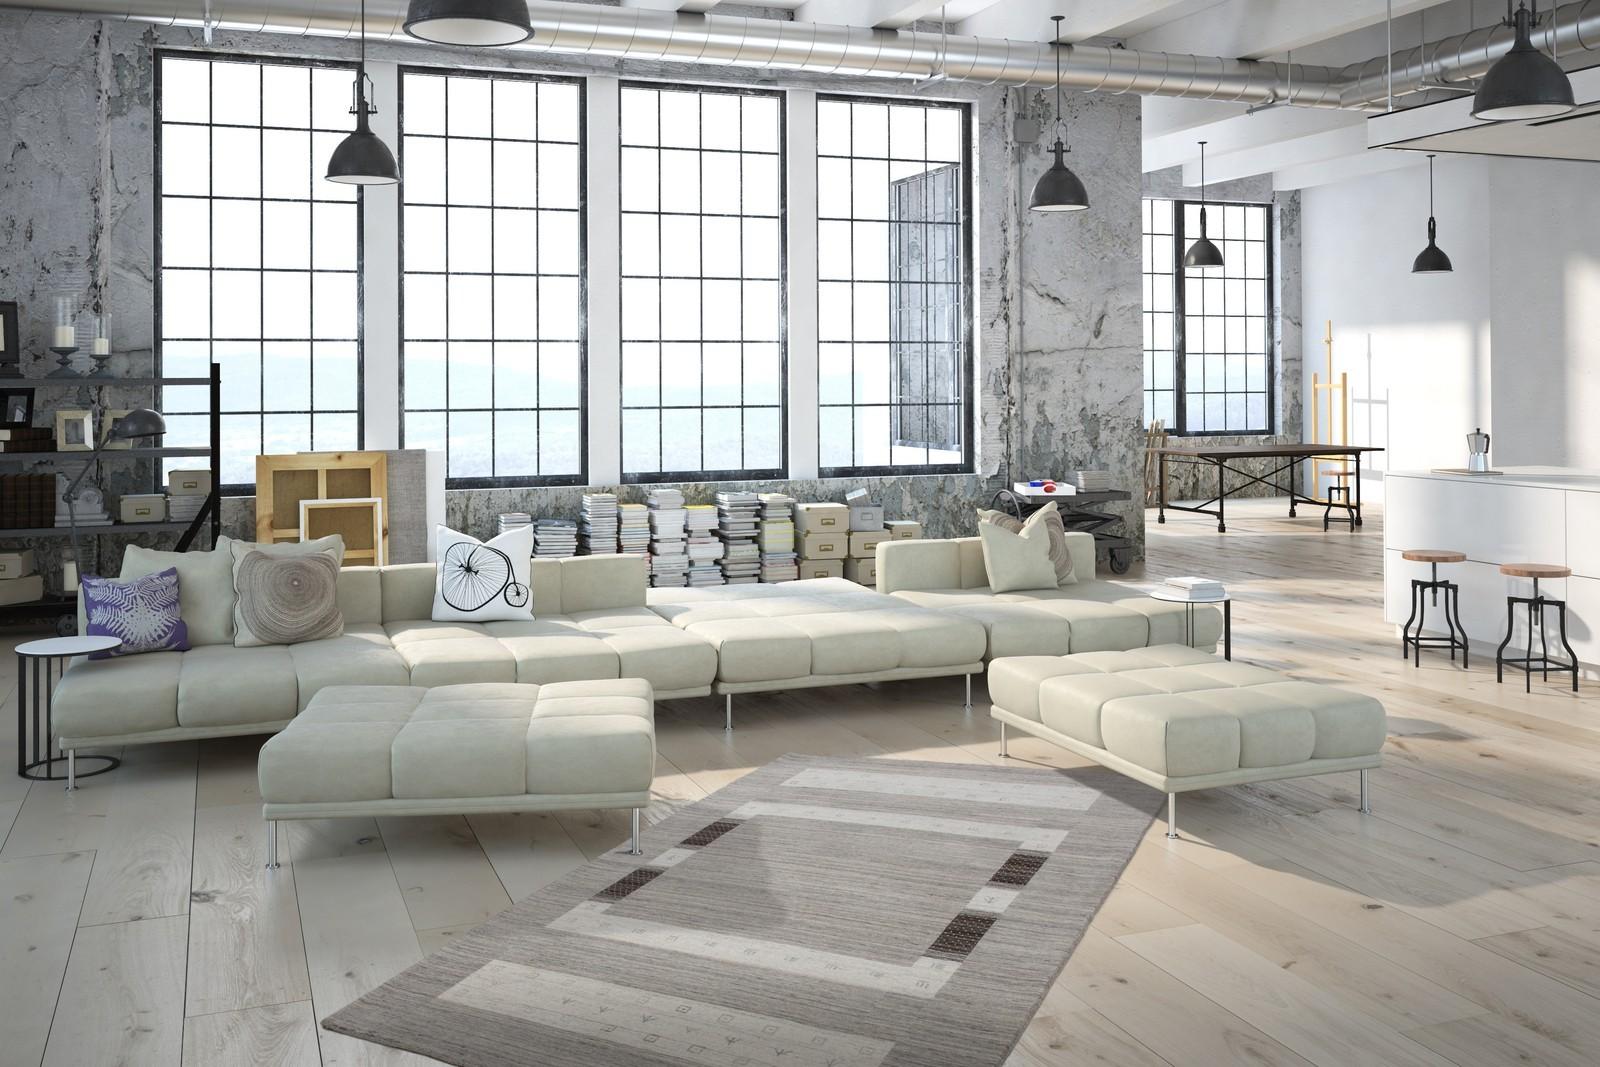 gallery of tapis designtapis en macloutapis tapis with